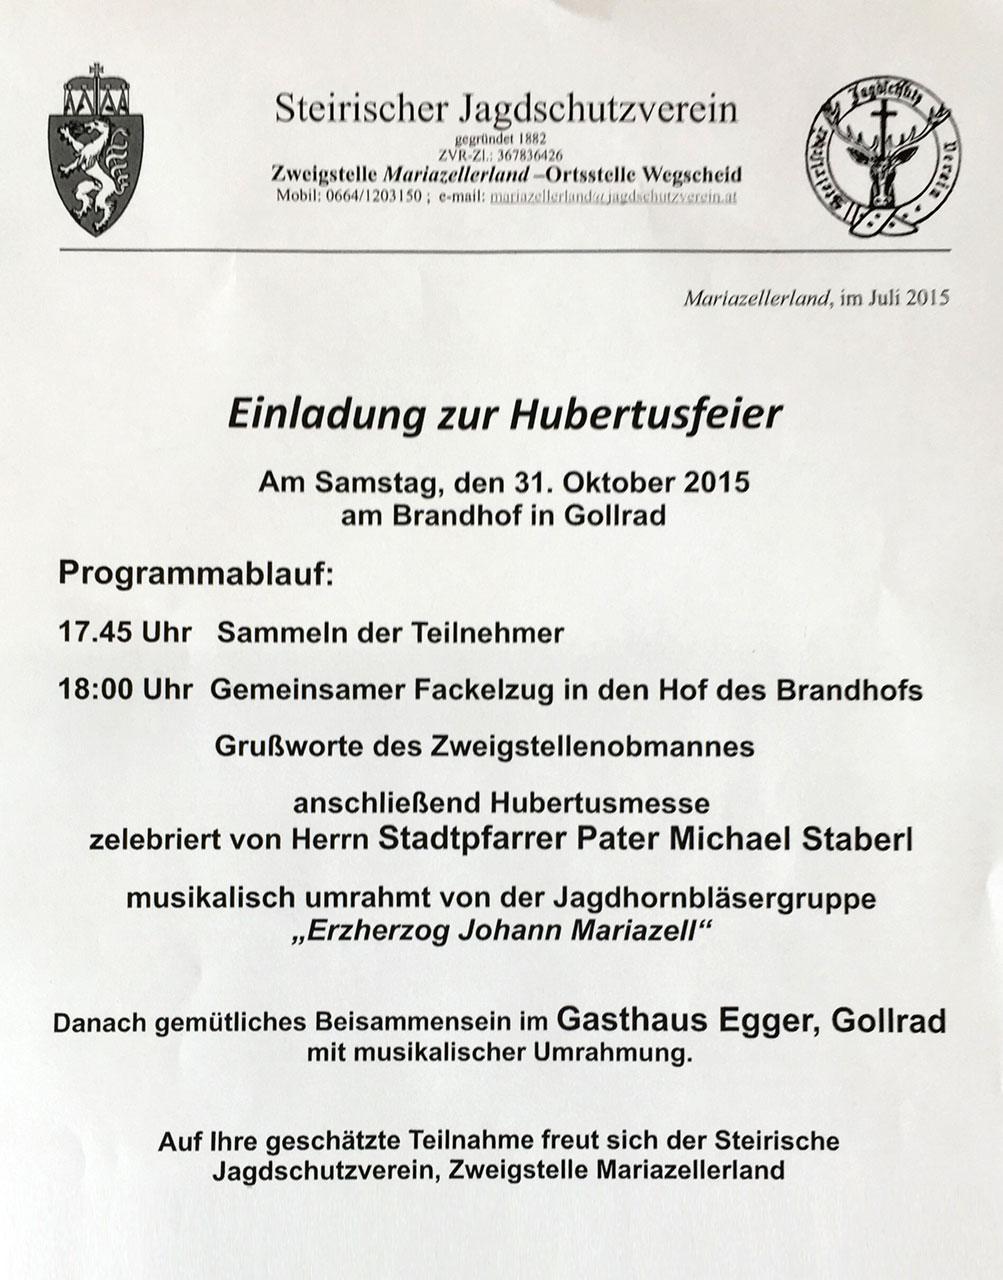 Hubertusfeier-2015-Mariazell